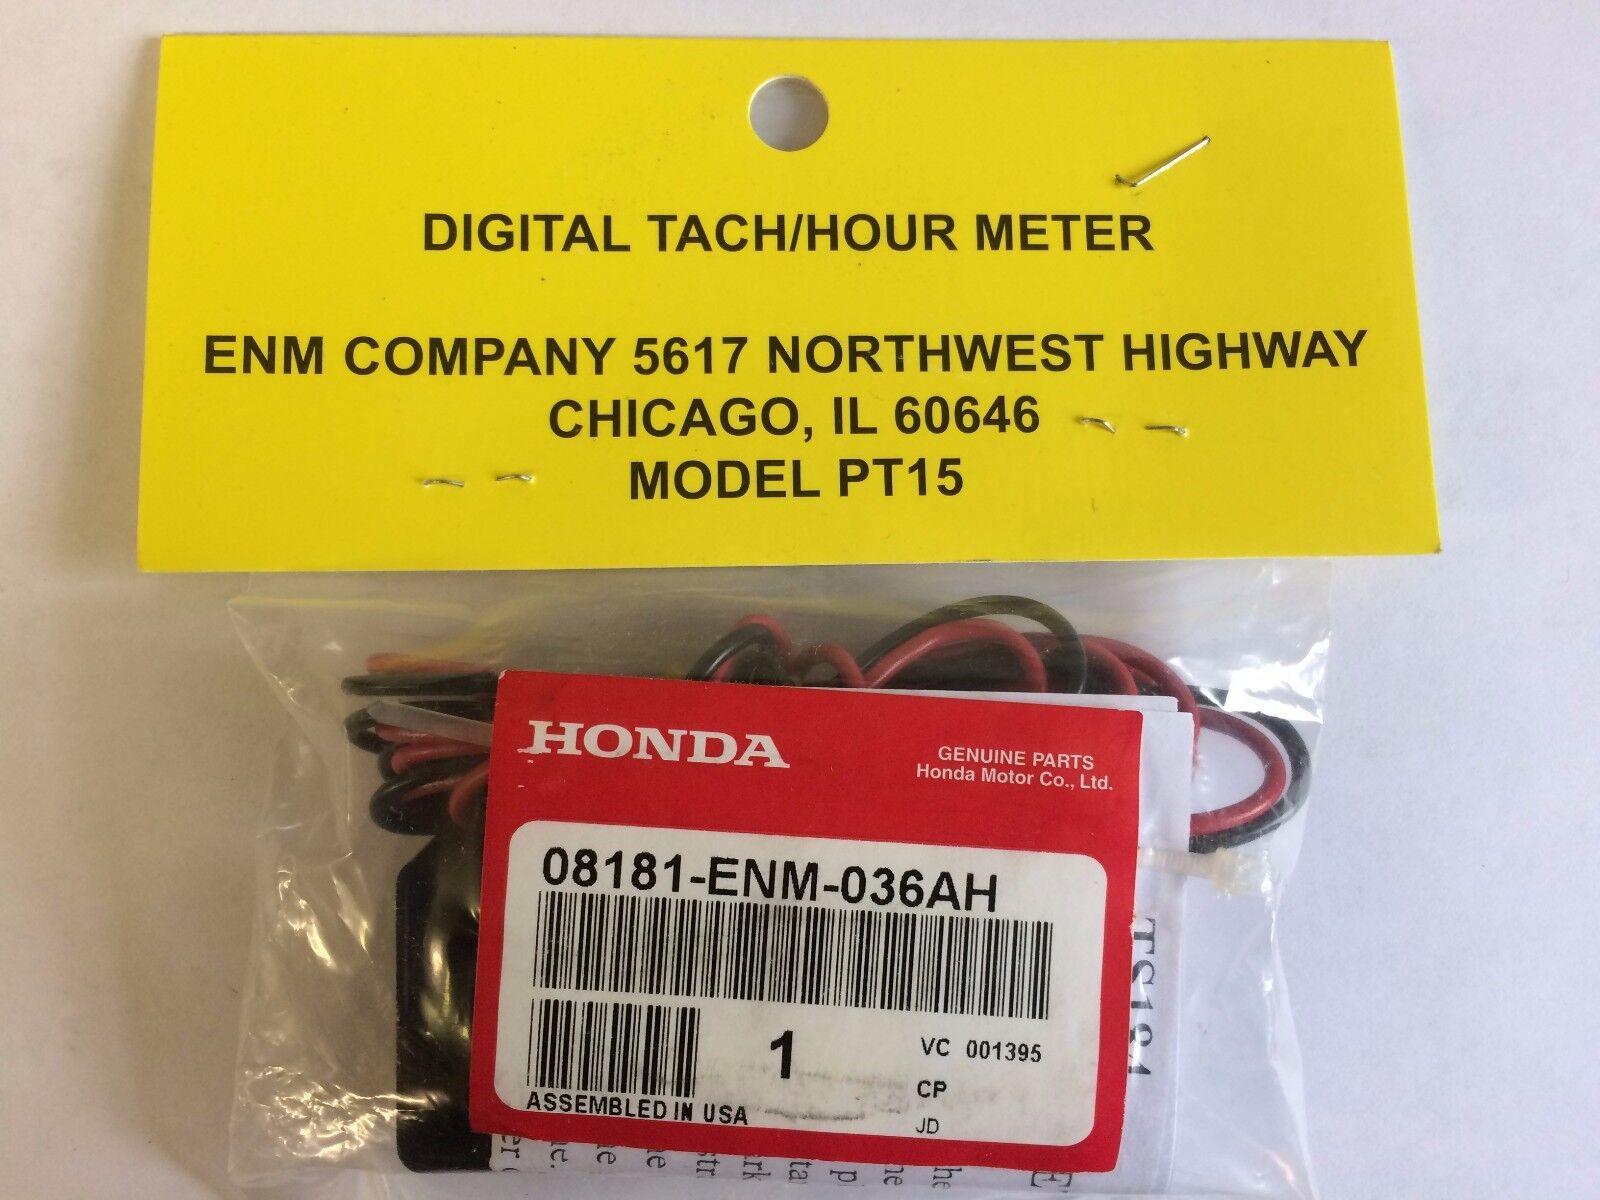 Honda 08181-ENM-036AH USAGE METER  ENM 36